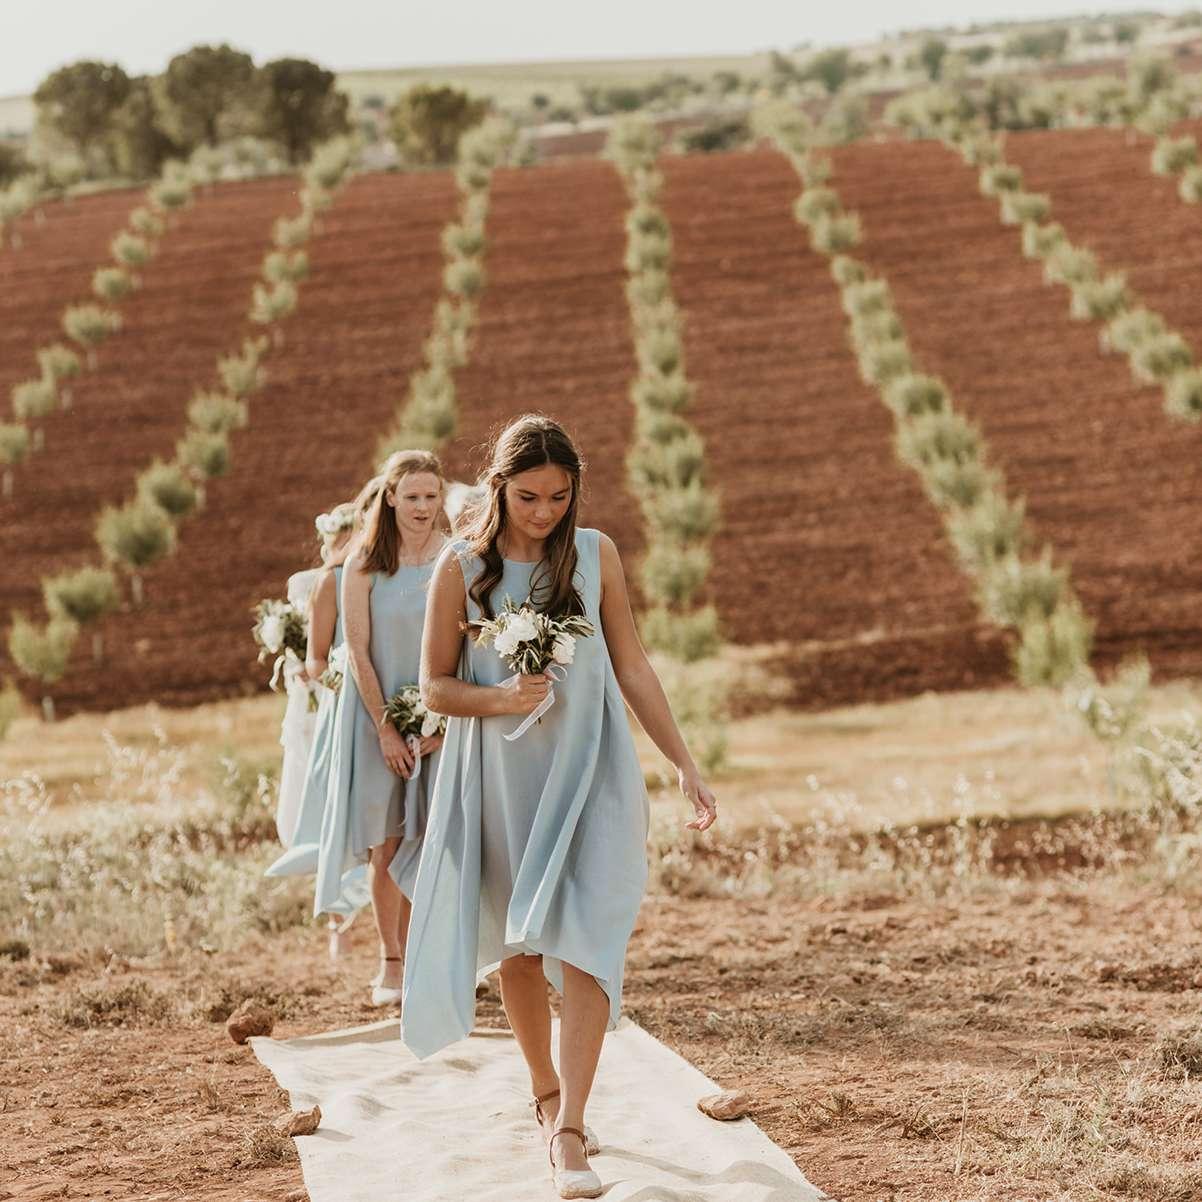 <p>Bridesmaids walking down the aisle</p><br><br>